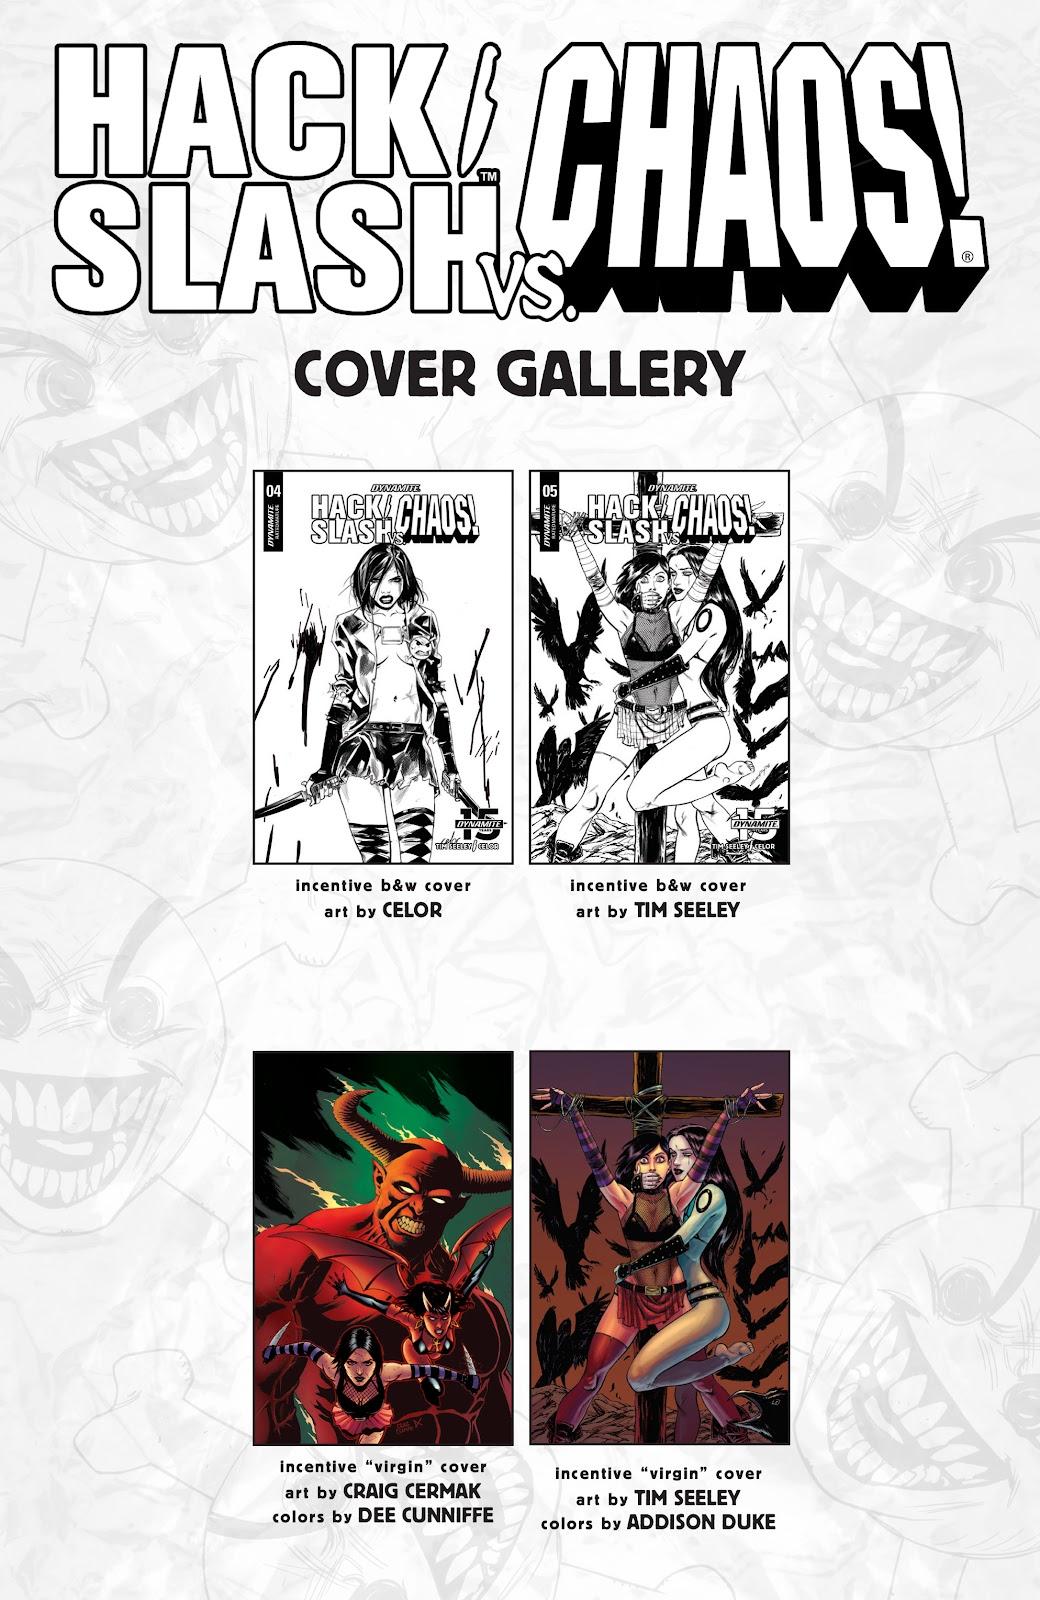 Read online Hack/Slash vs. Chaos comic -  Issue #5 - 26